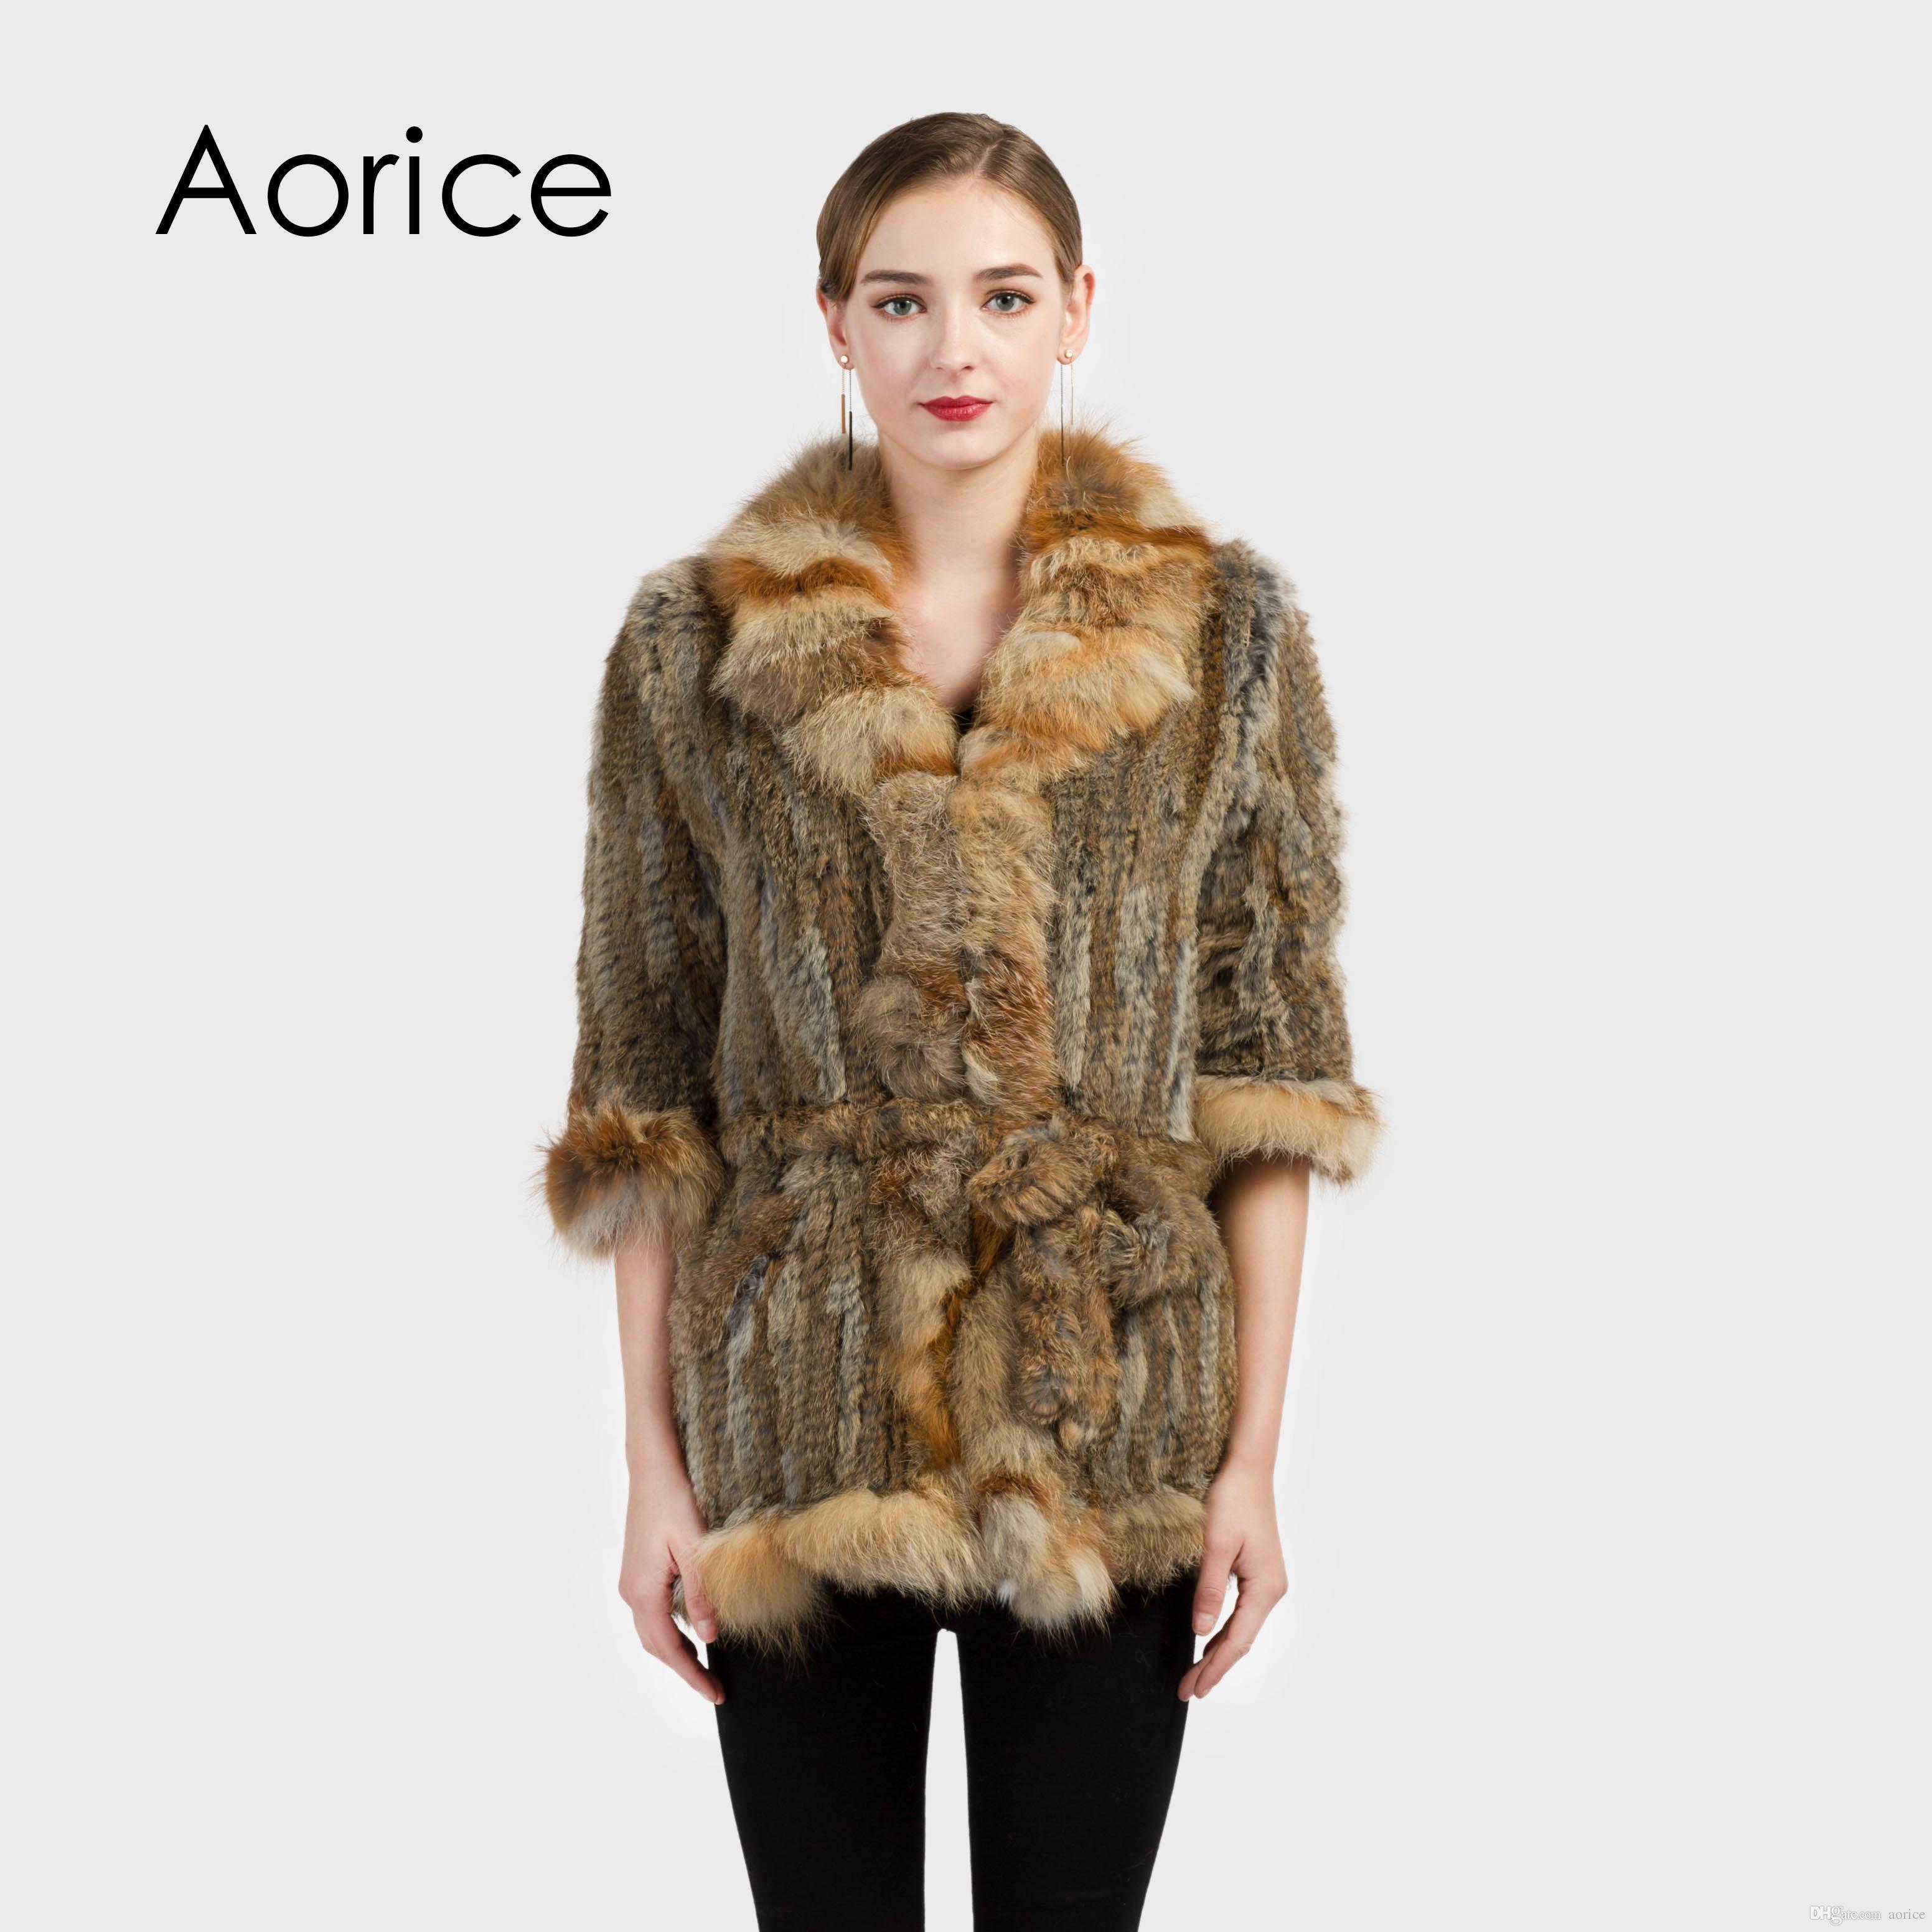 436b5e62c3c 2019 Pudi CT7017 Genuine Rabbit Fur Coat Women S Warm Natural Real Fur Long  Jacket With Fox Fur Collar Belt Plus Size Customized From Aorice